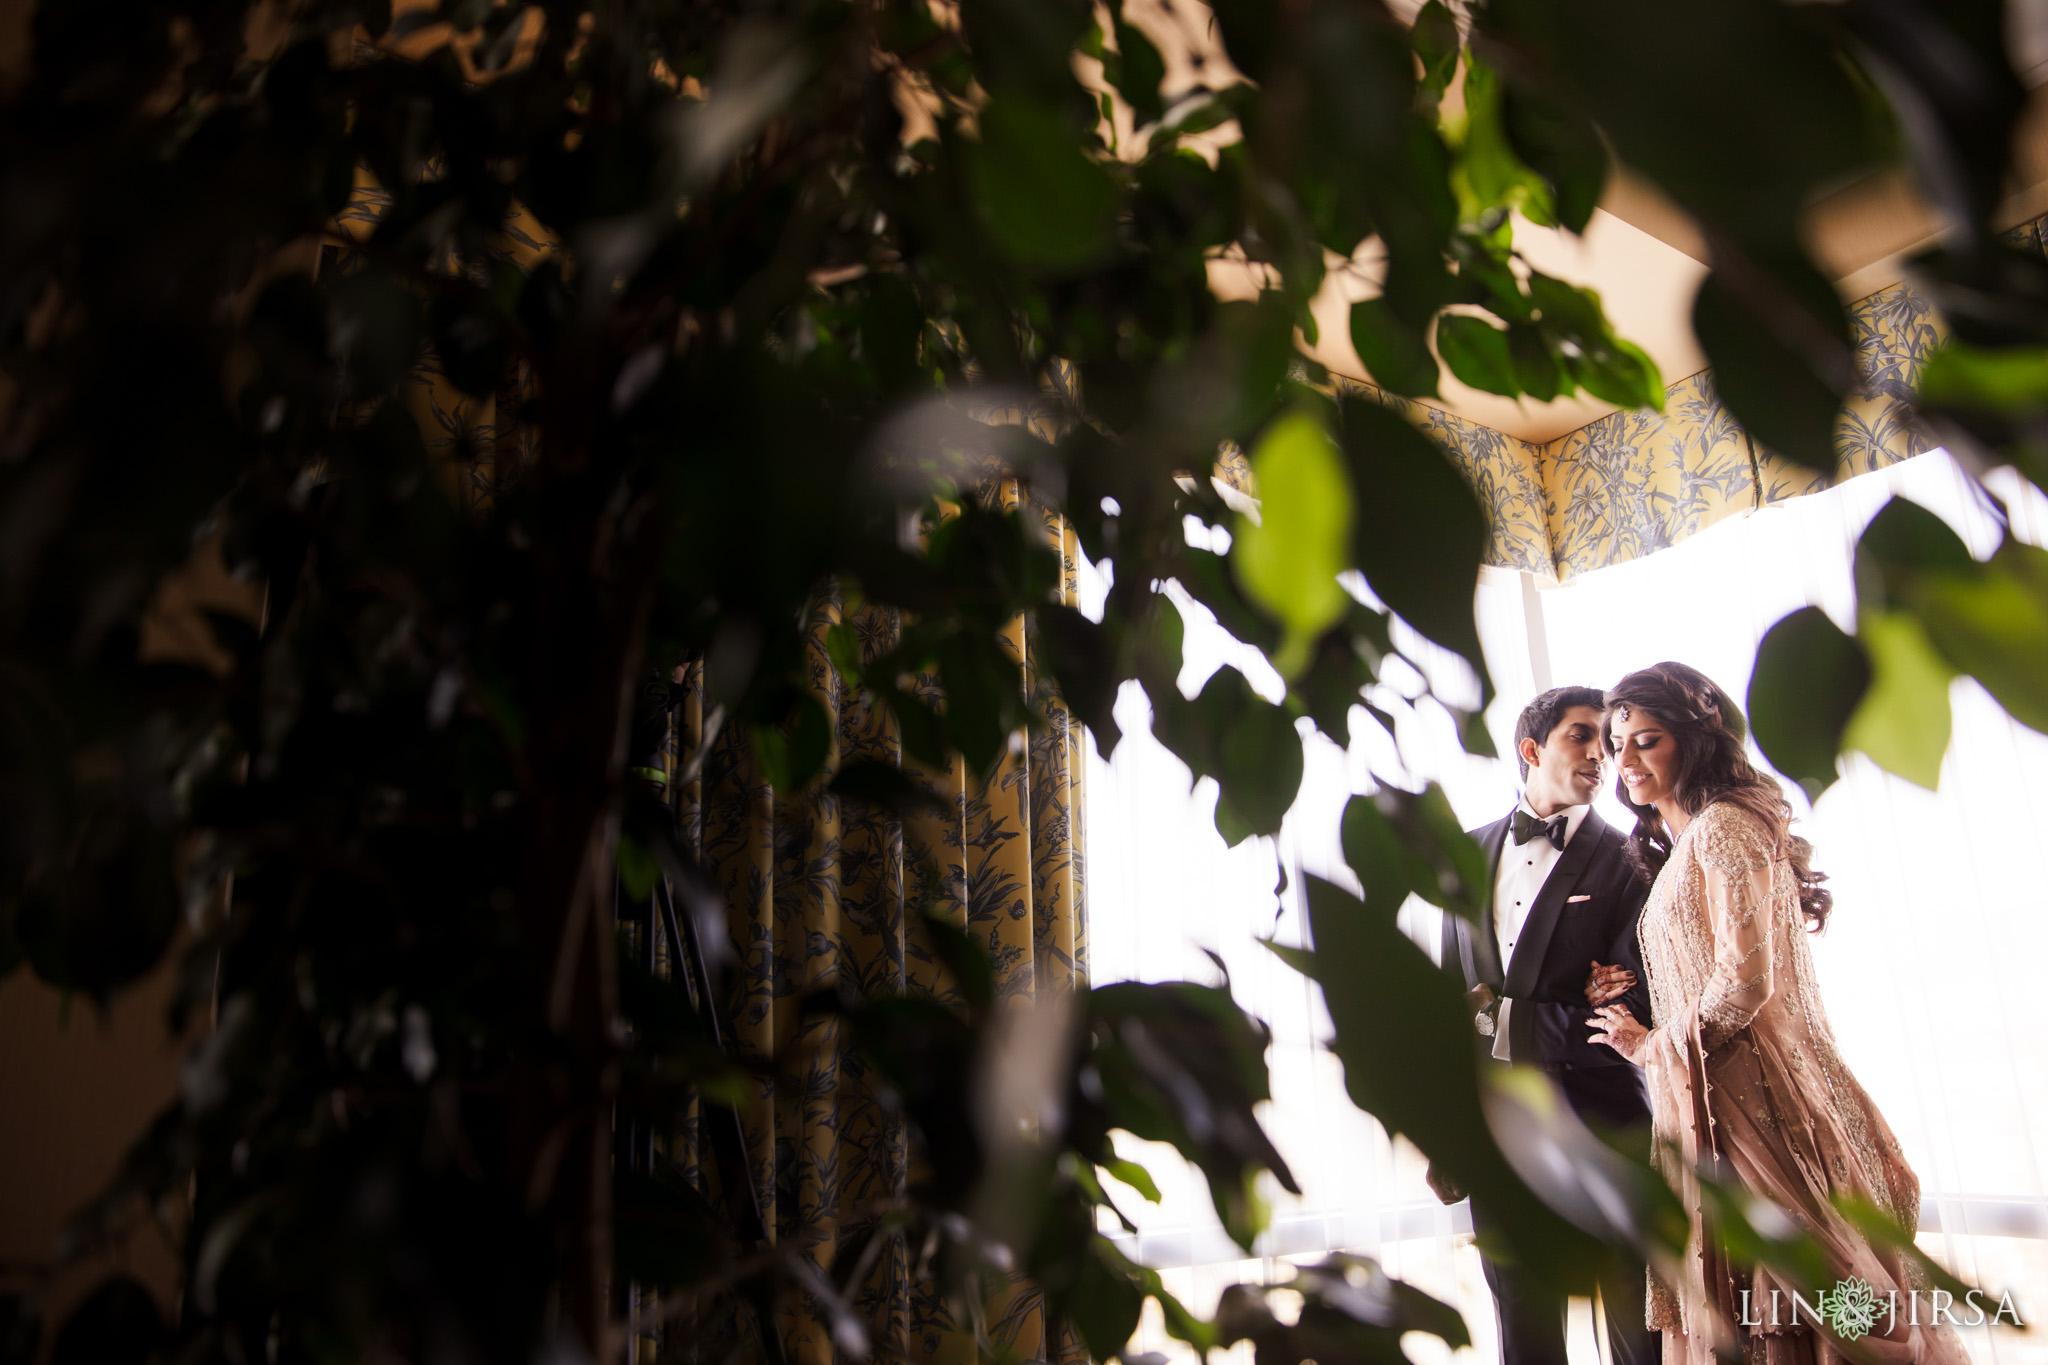 005 four seasons westlake village muslim wedding valima photography